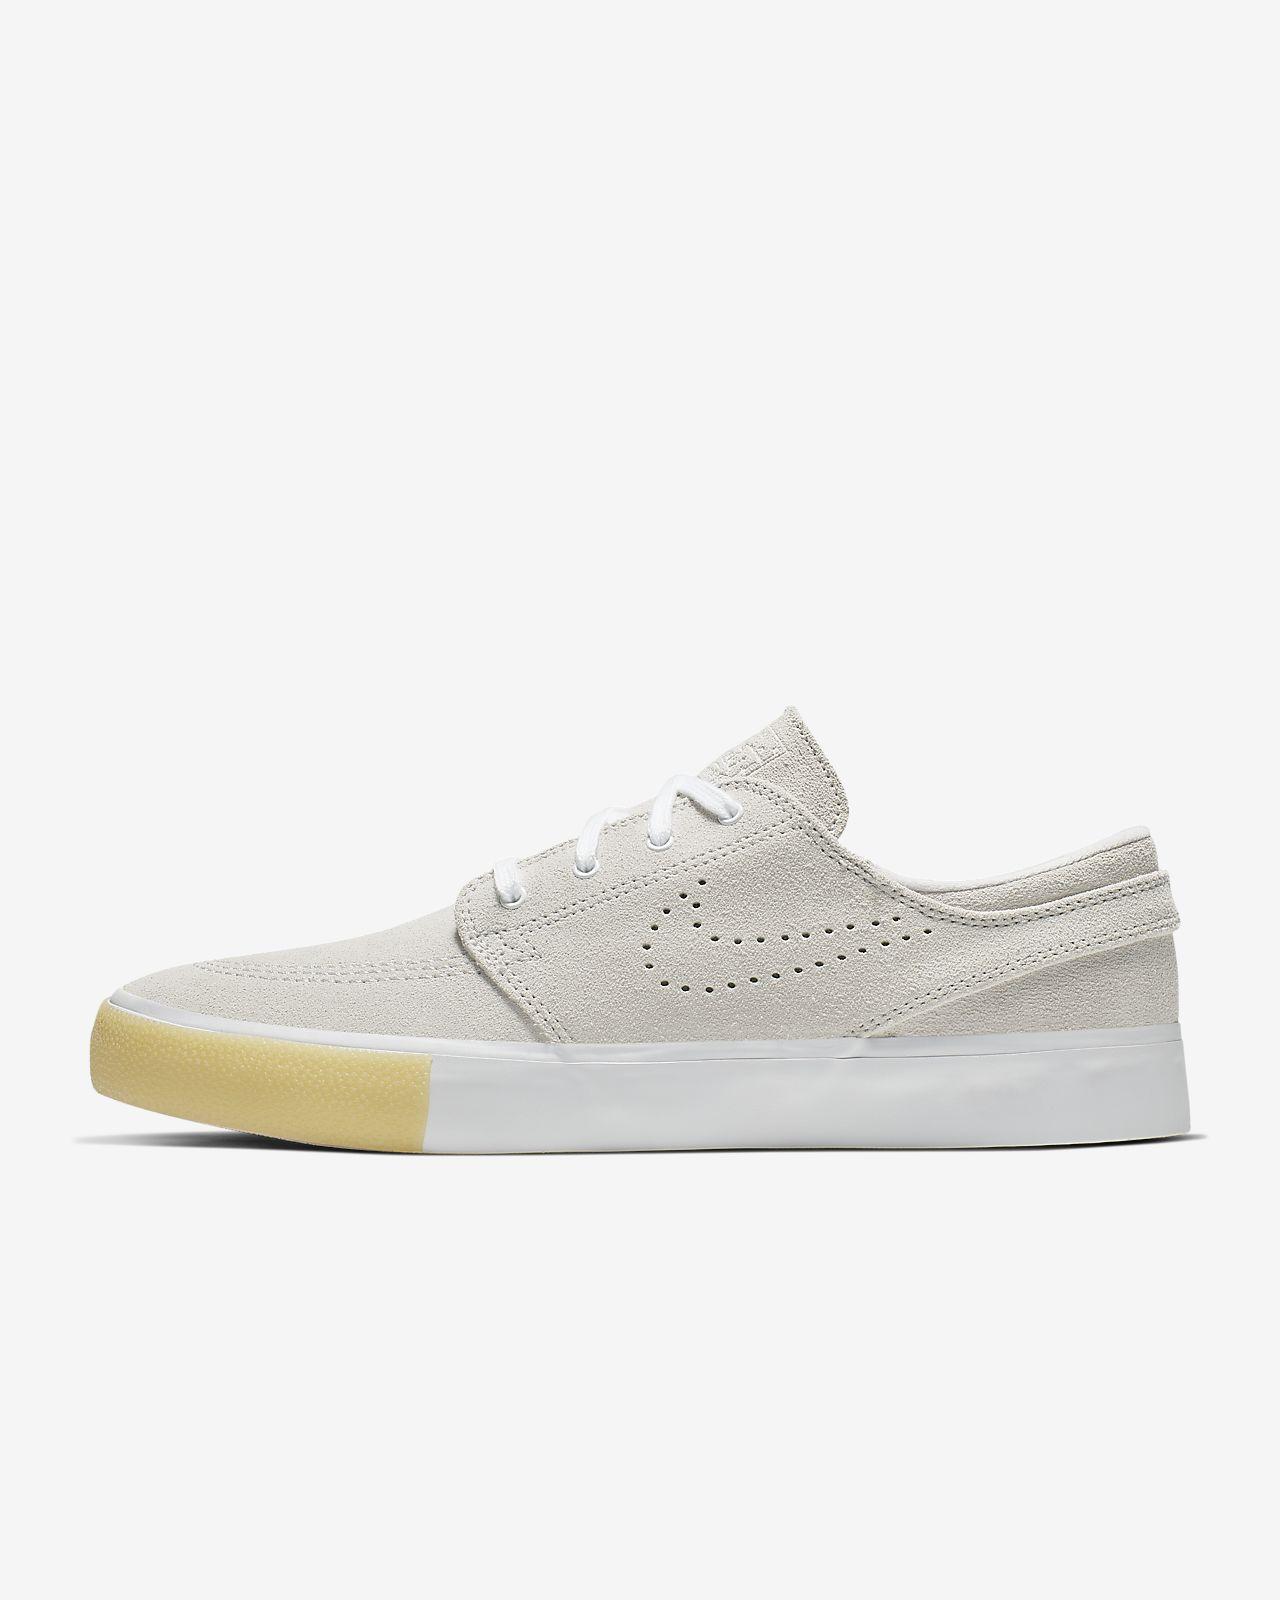 Nike SB Zoom Stefan Janoski RM SE Skate Shoe